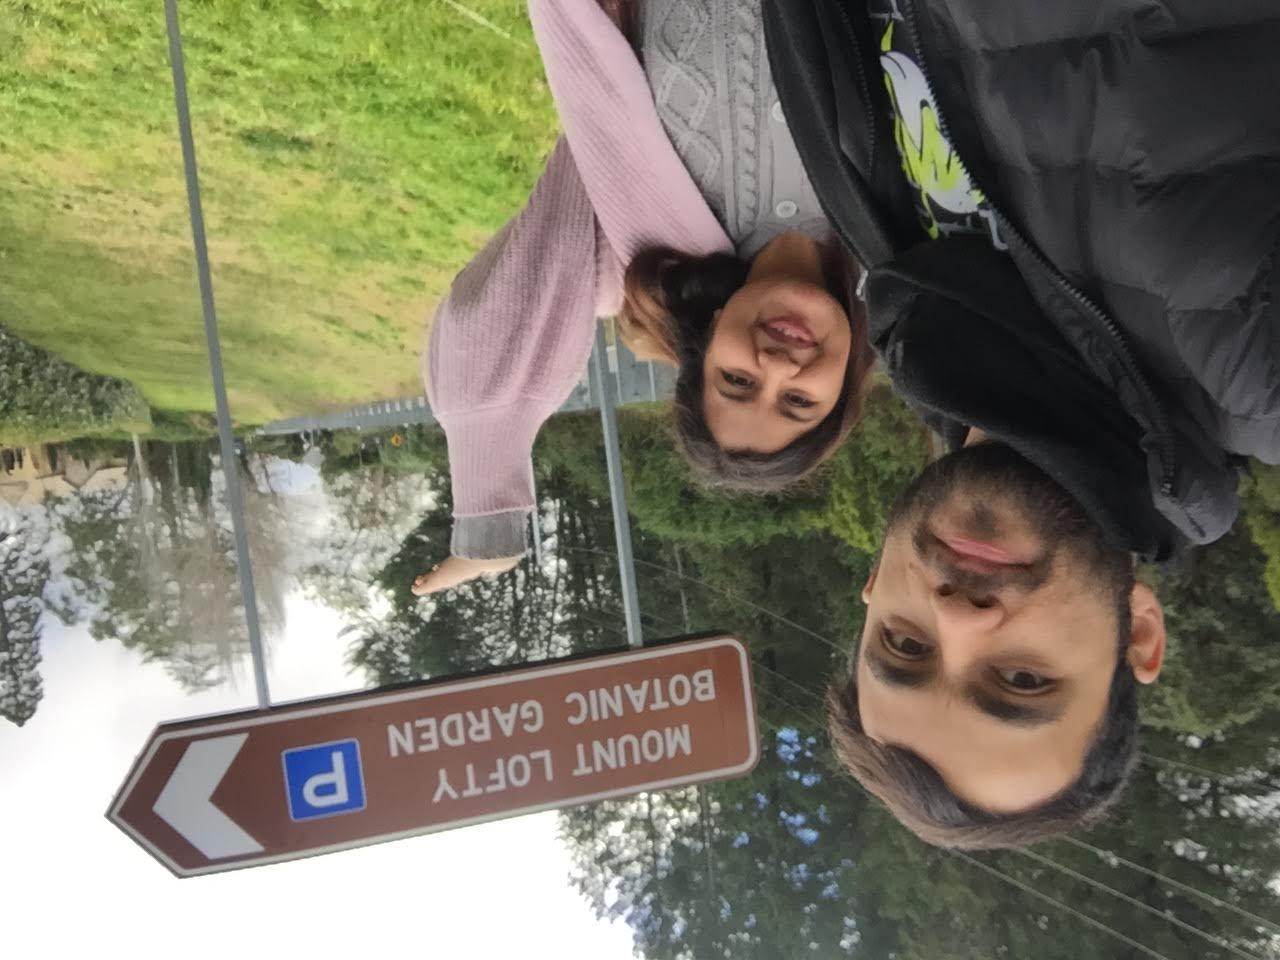 Sonisha and lakshman at Mount Lofty Botanic Garden entry